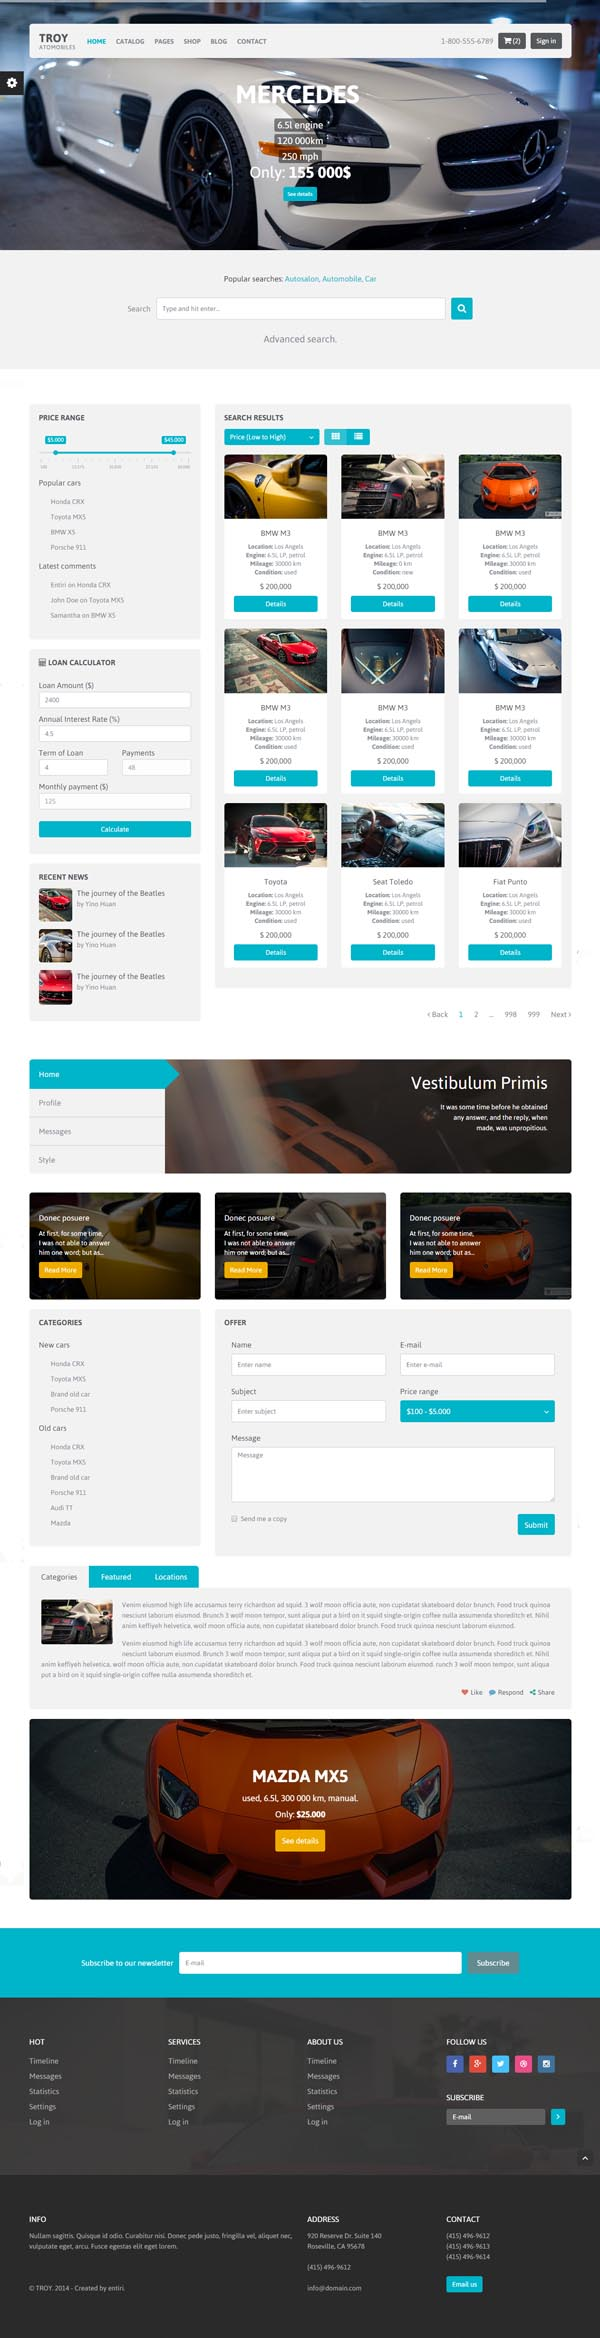 TROY Automotive Cars Portal - HTML Template